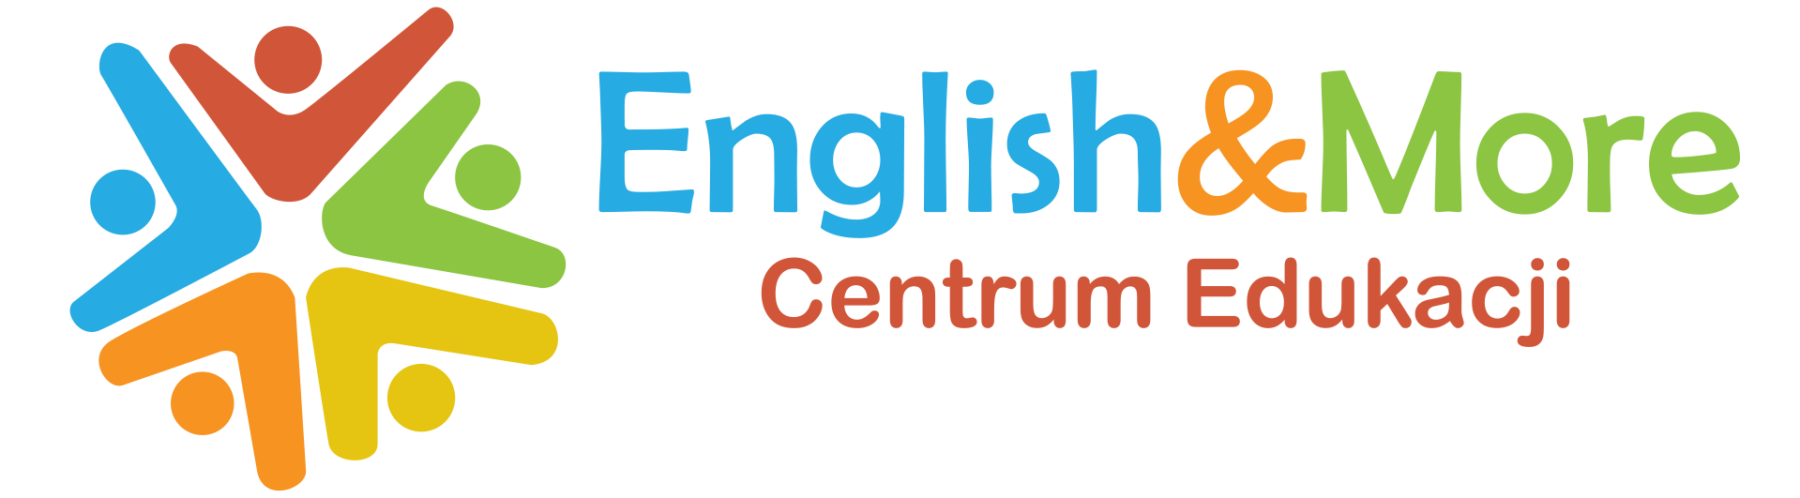 English&More Centrum Edukacji